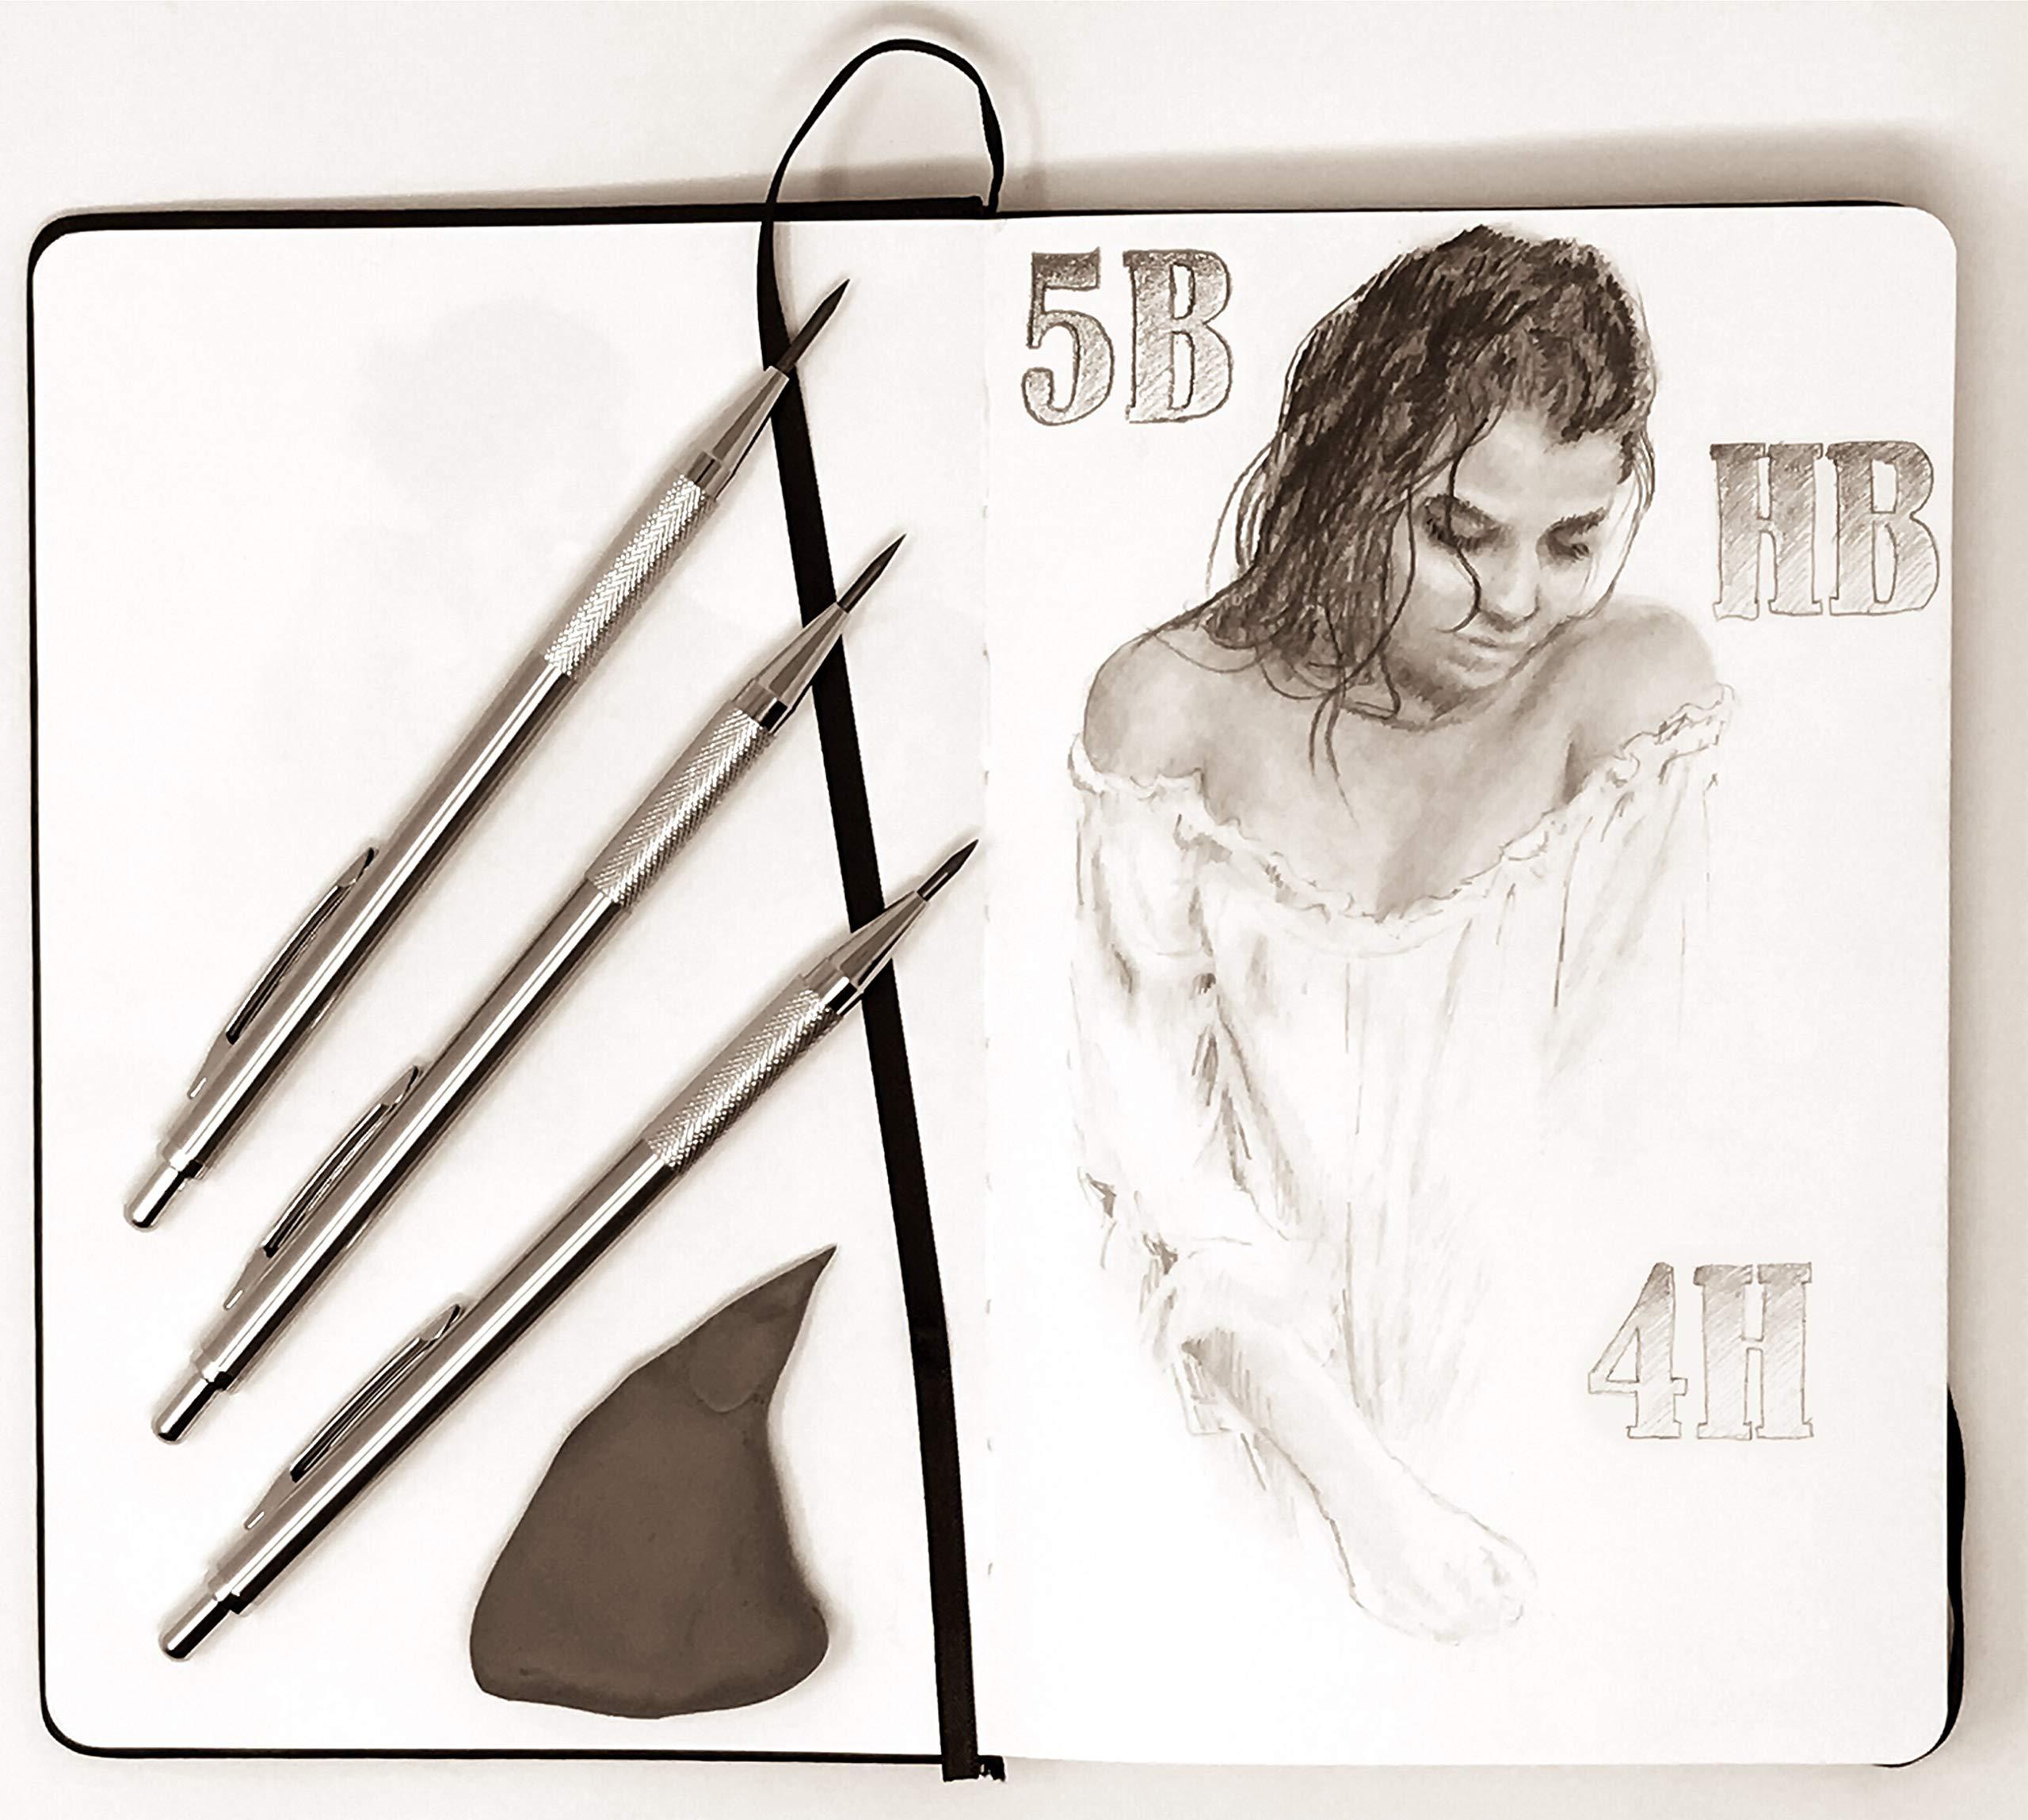 Drawing Mechanical Pencils 9-Piece | Kneaded Eraser | 2 mm Pencil Lead Refills for Artists | Travel Art Set Case | Professional Sketching & Drawing Kit | Metal Pen Barrel by MstrSktch (Image #5)